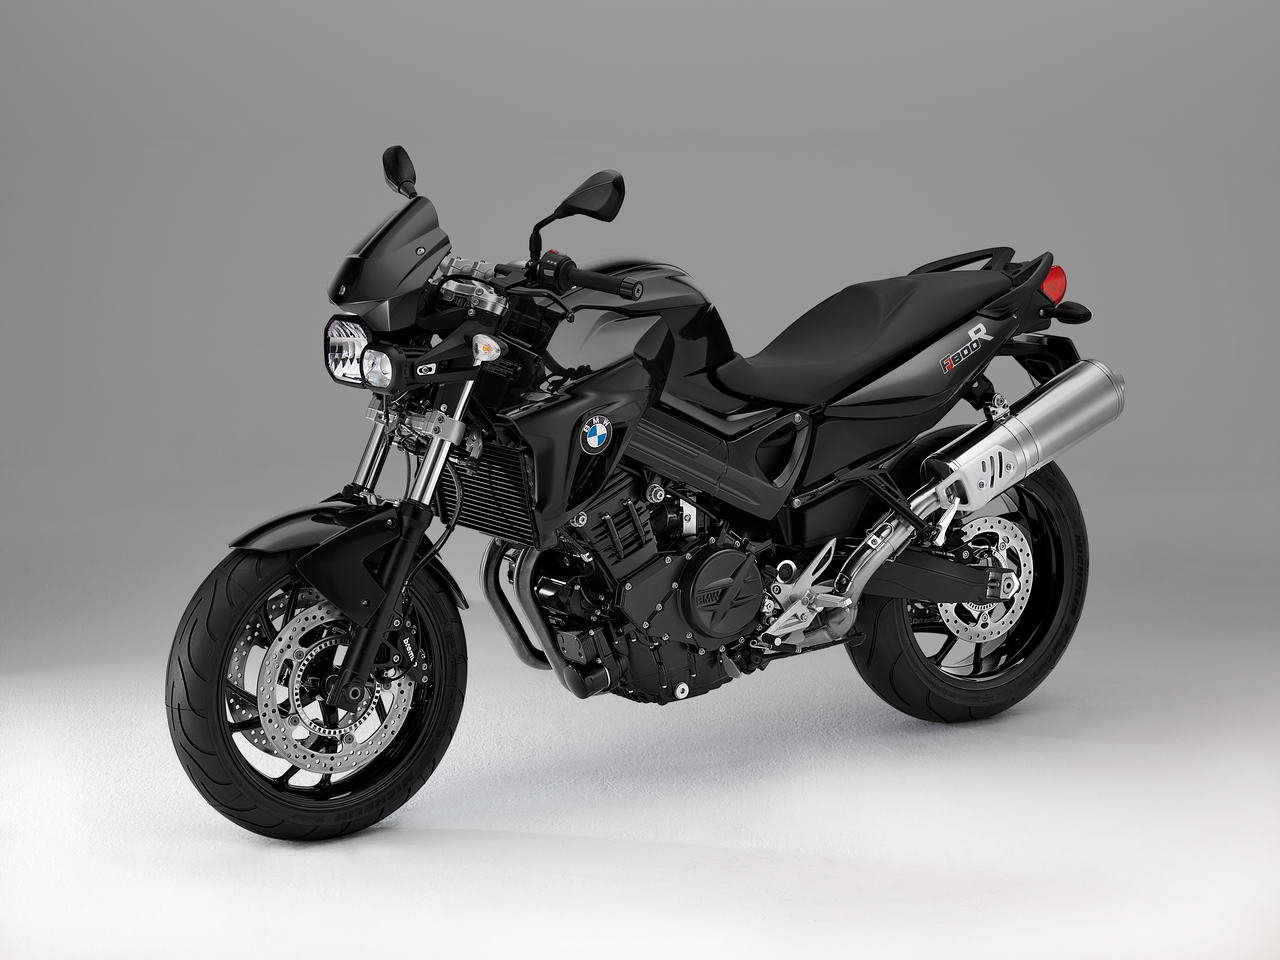 Listino Bmw C650 GT Scooter oltre 300 - image 14451_bmw-f800-r on https://moto.motori.net